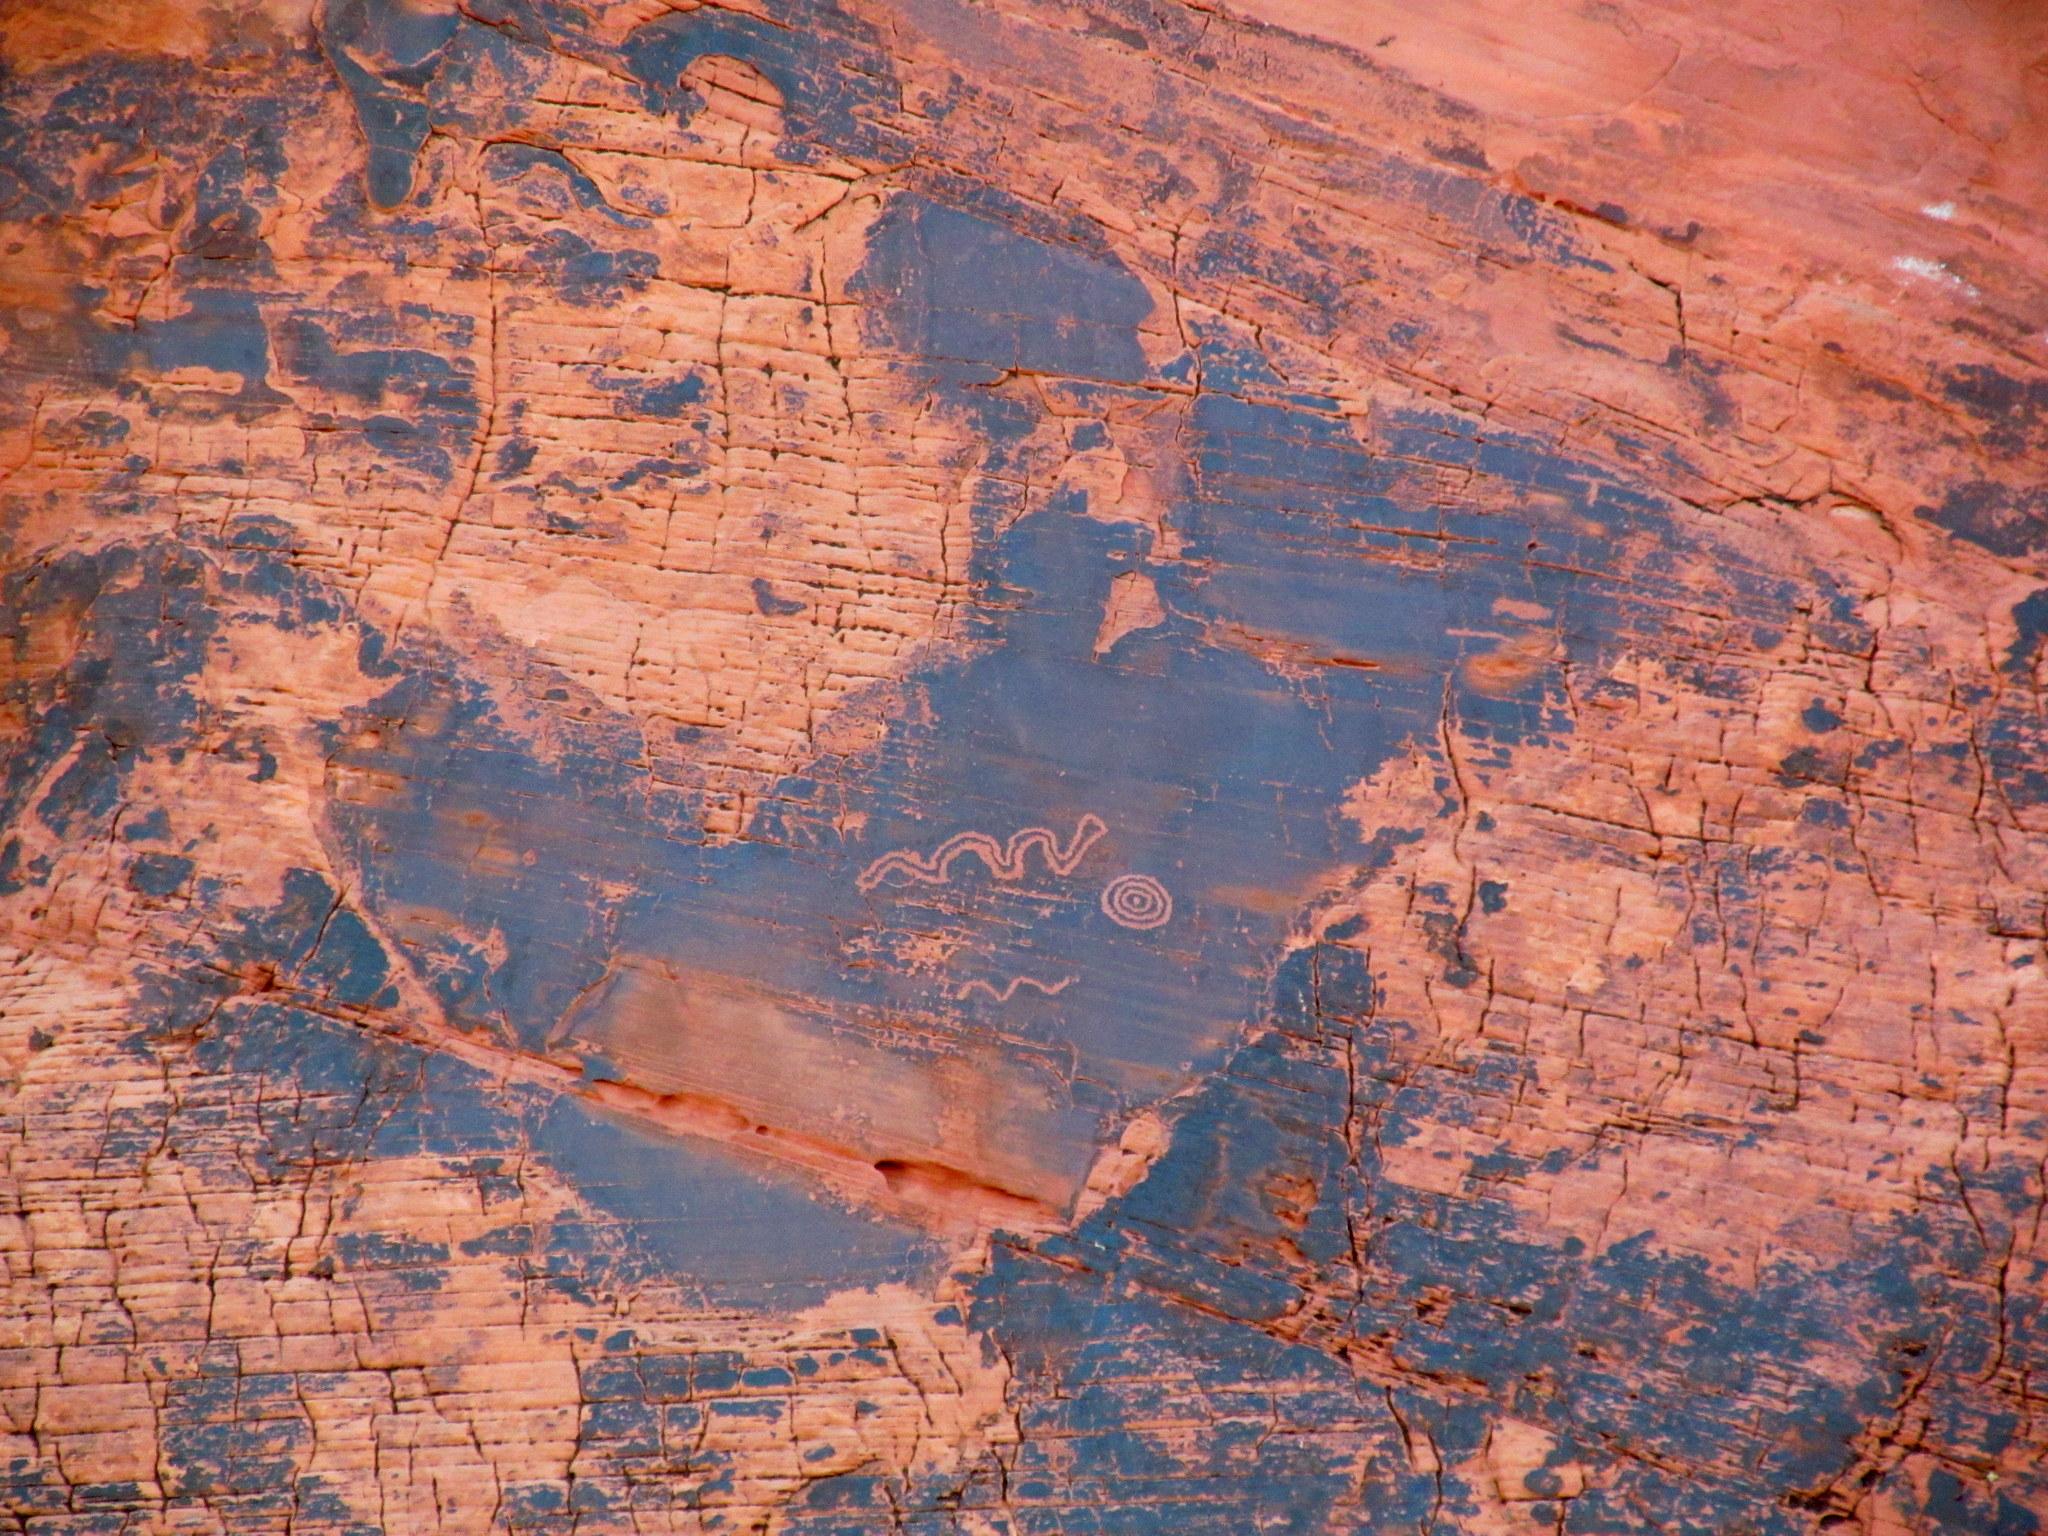 Photo: Petroglyphs on the way to Atlatl rock